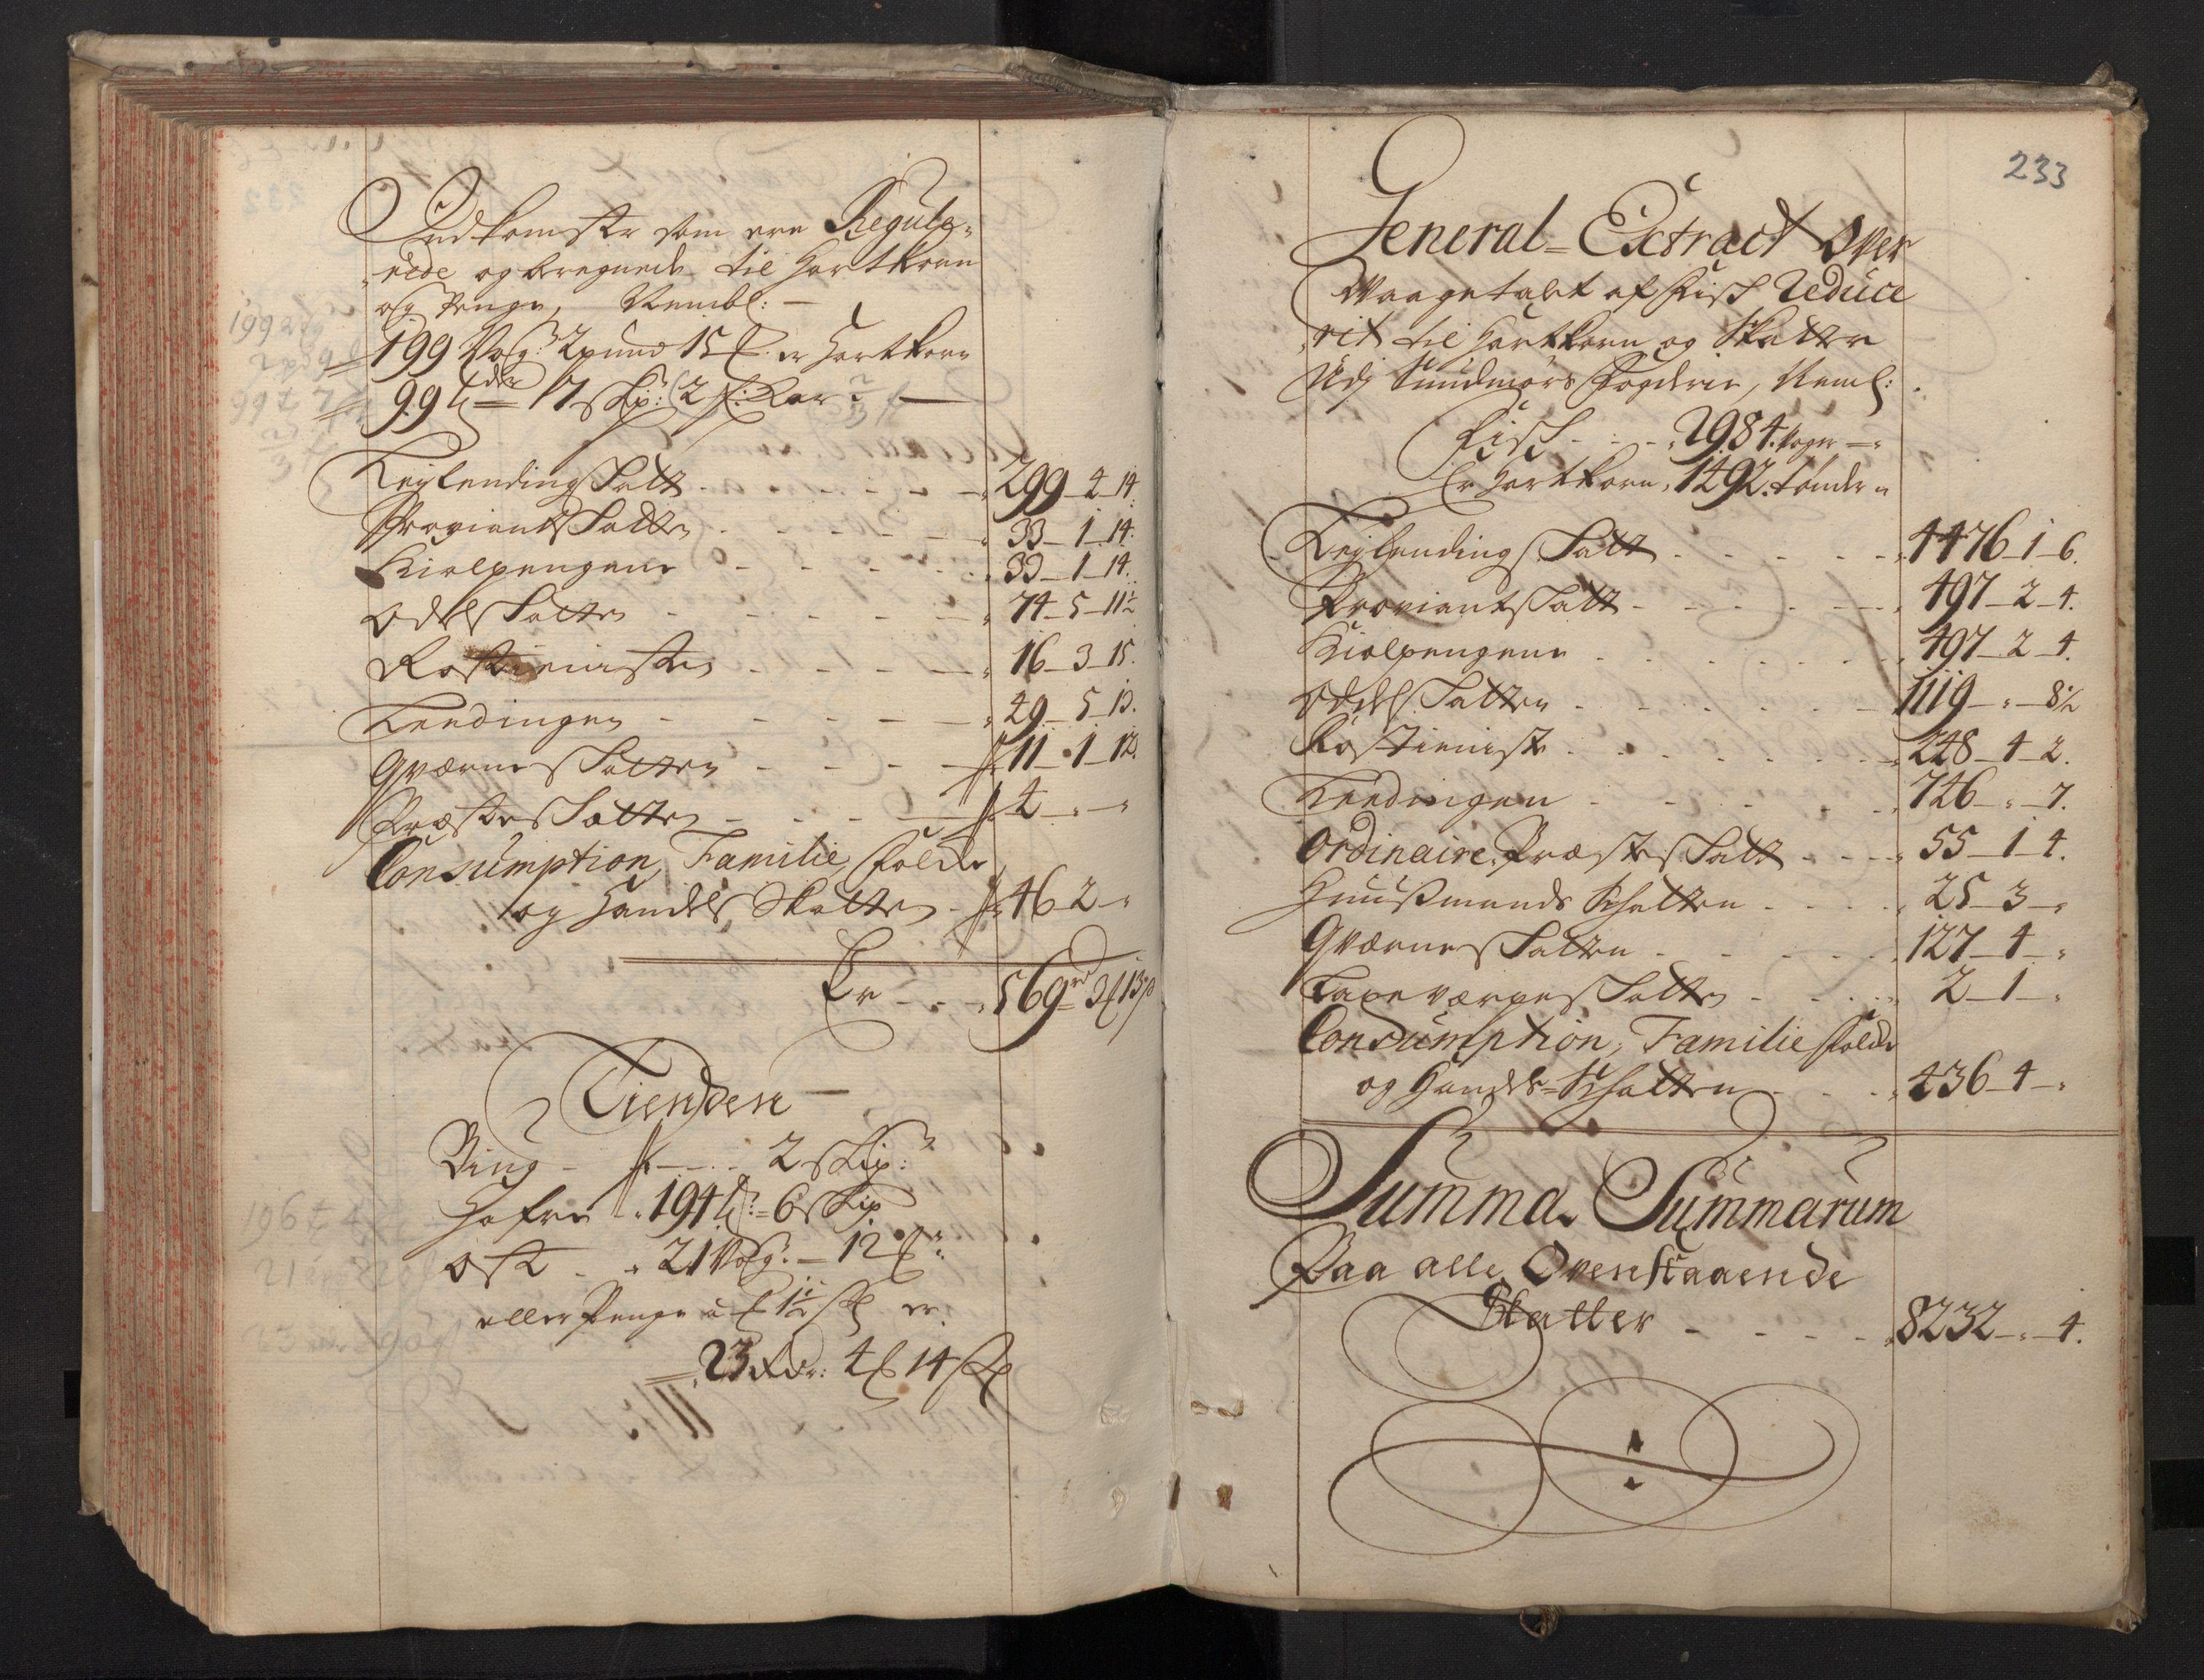 RA, Rentekammeret inntil 1814, Realistisk ordnet avdeling, N/Nb/Nbf/L0148: Sunnmøre, prøvematrikkel, 1714, s. 232b-233a